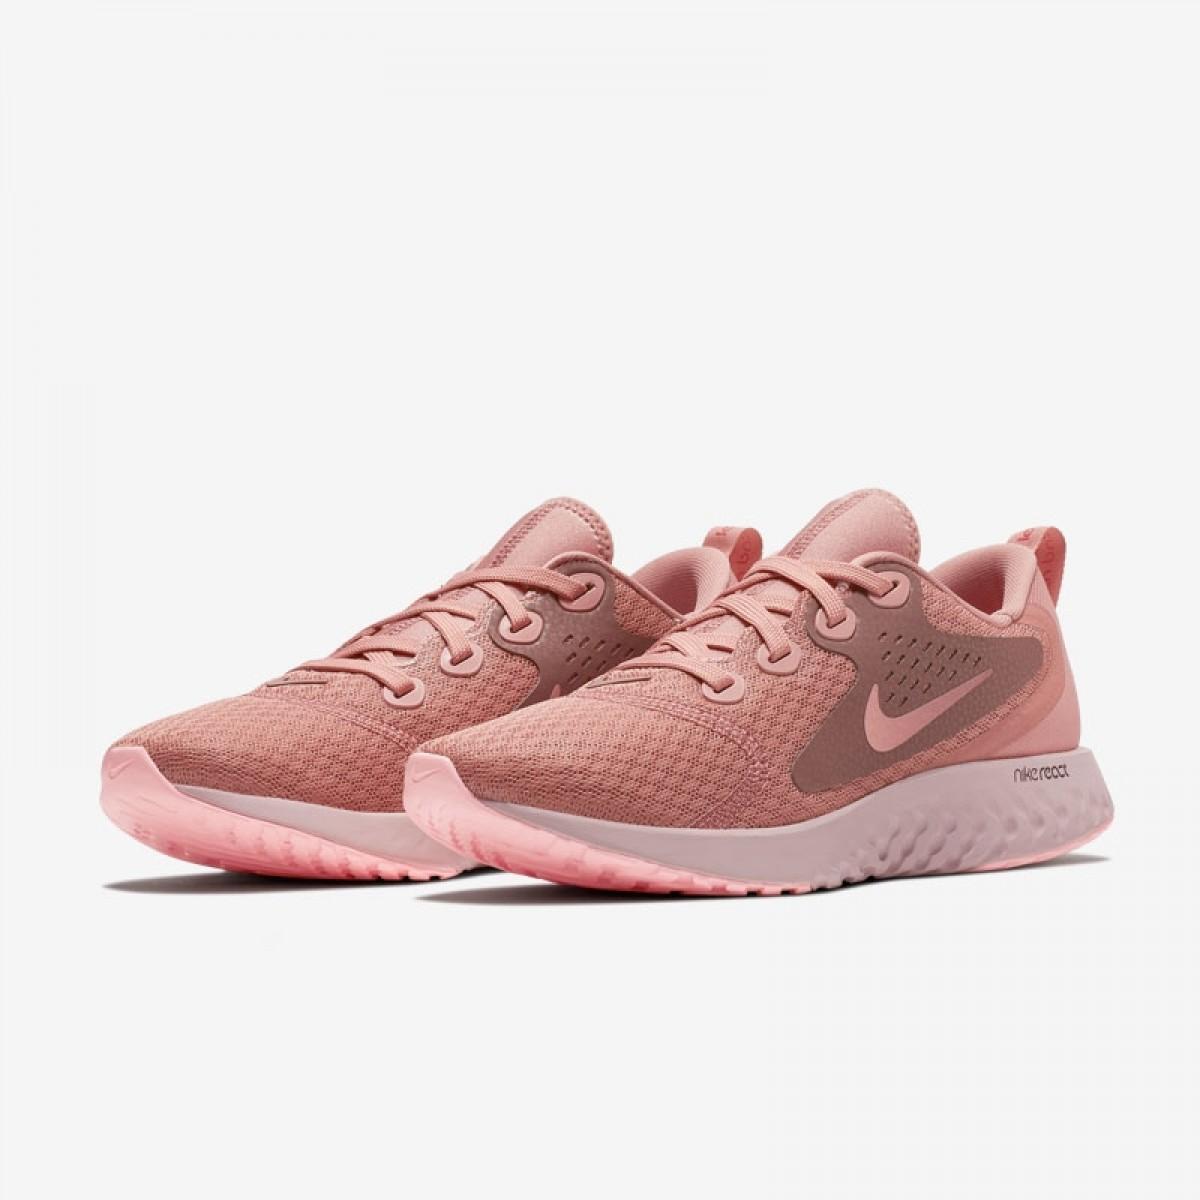 Nike Legend React Women's 'Light pink' AA1626-602